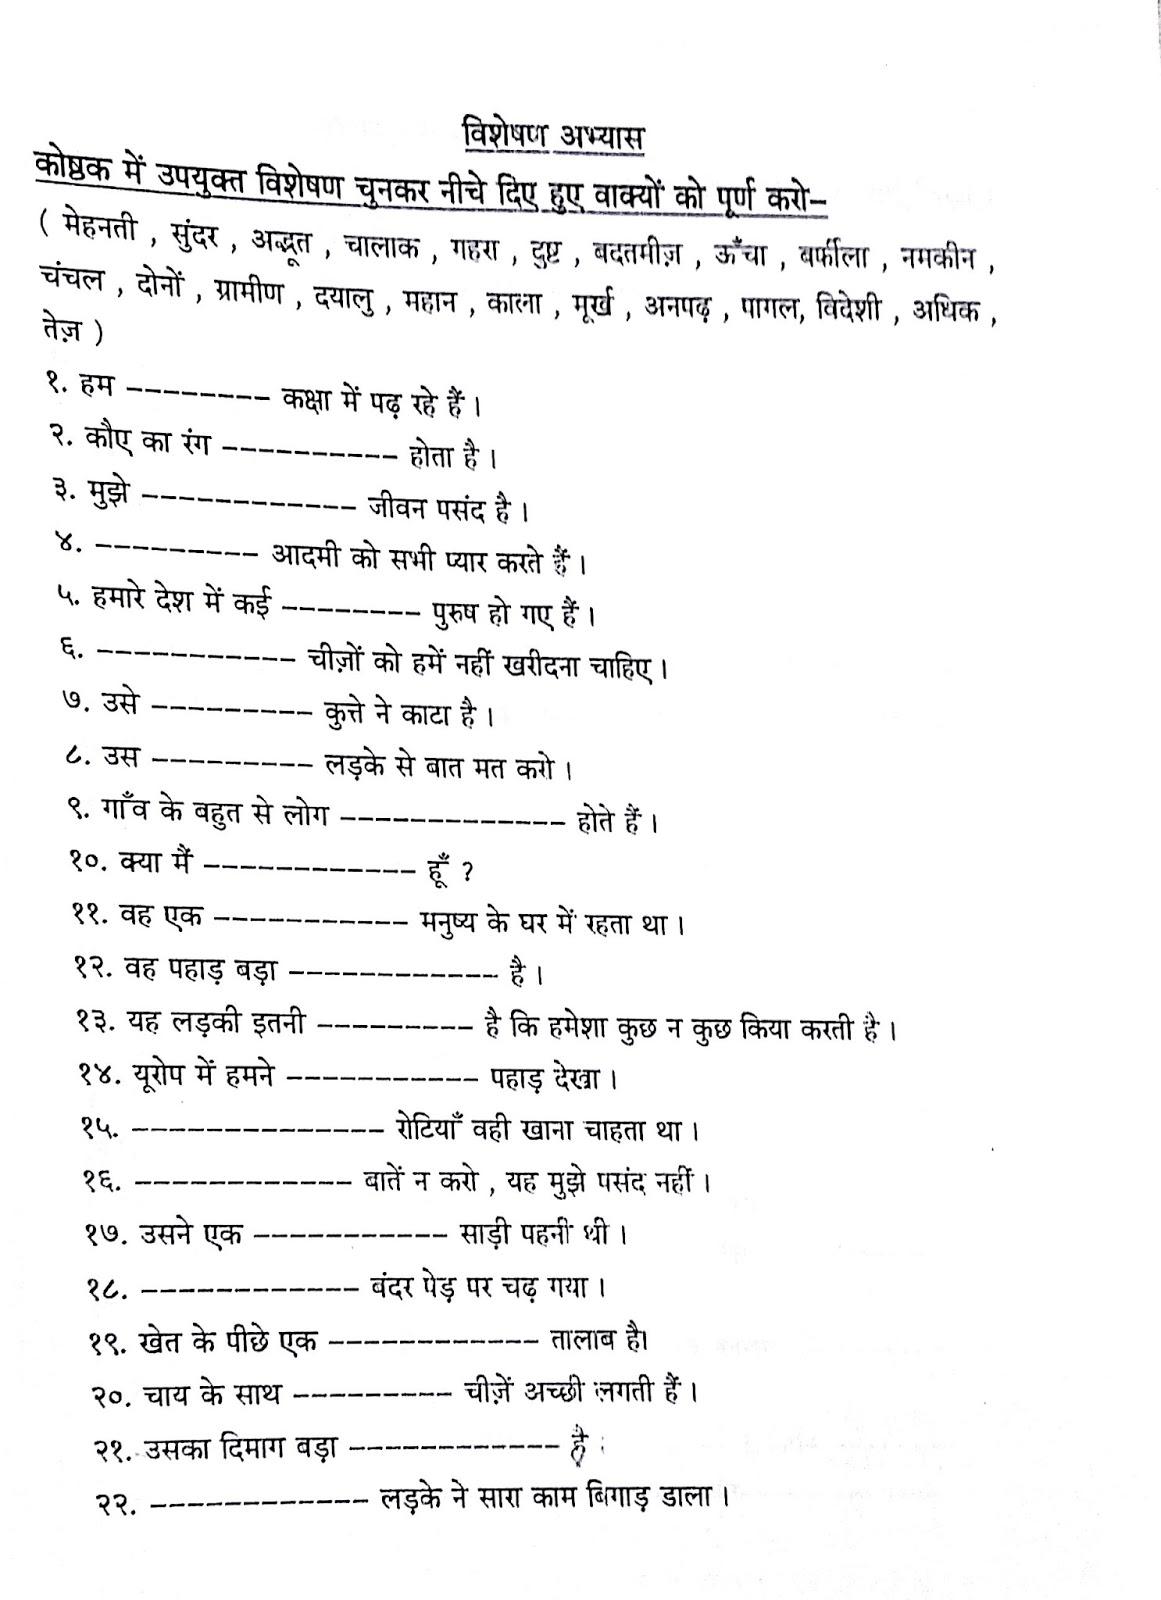 hindi grammar work sheet collection for classes 5 6 7 8 adjectives work sheets for classes 3. Black Bedroom Furniture Sets. Home Design Ideas